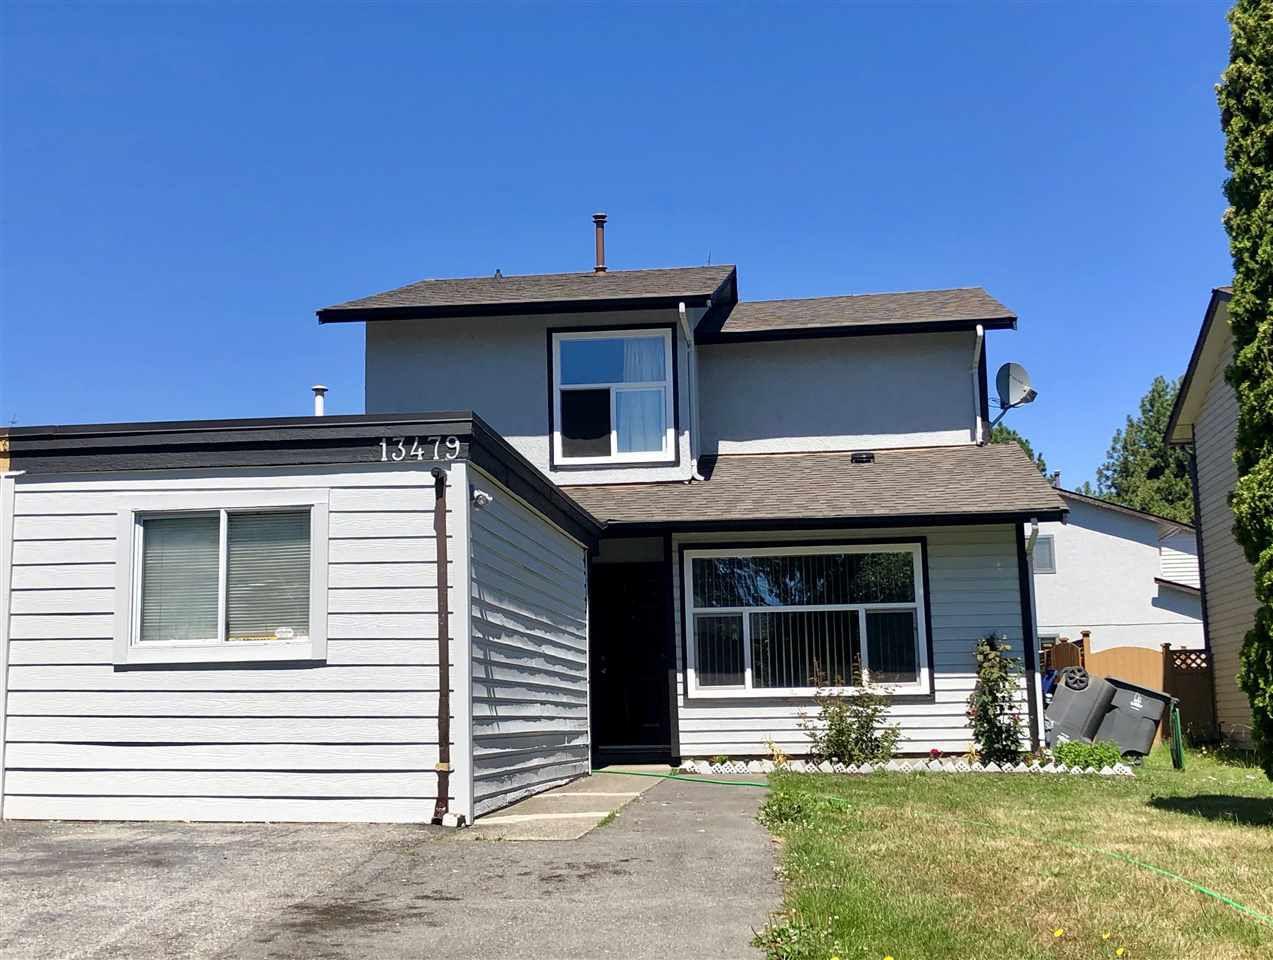 Main Photo: 13479 69 Avenue in Surrey: West Newton House 1/2 Duplex for sale : MLS®# R2307213